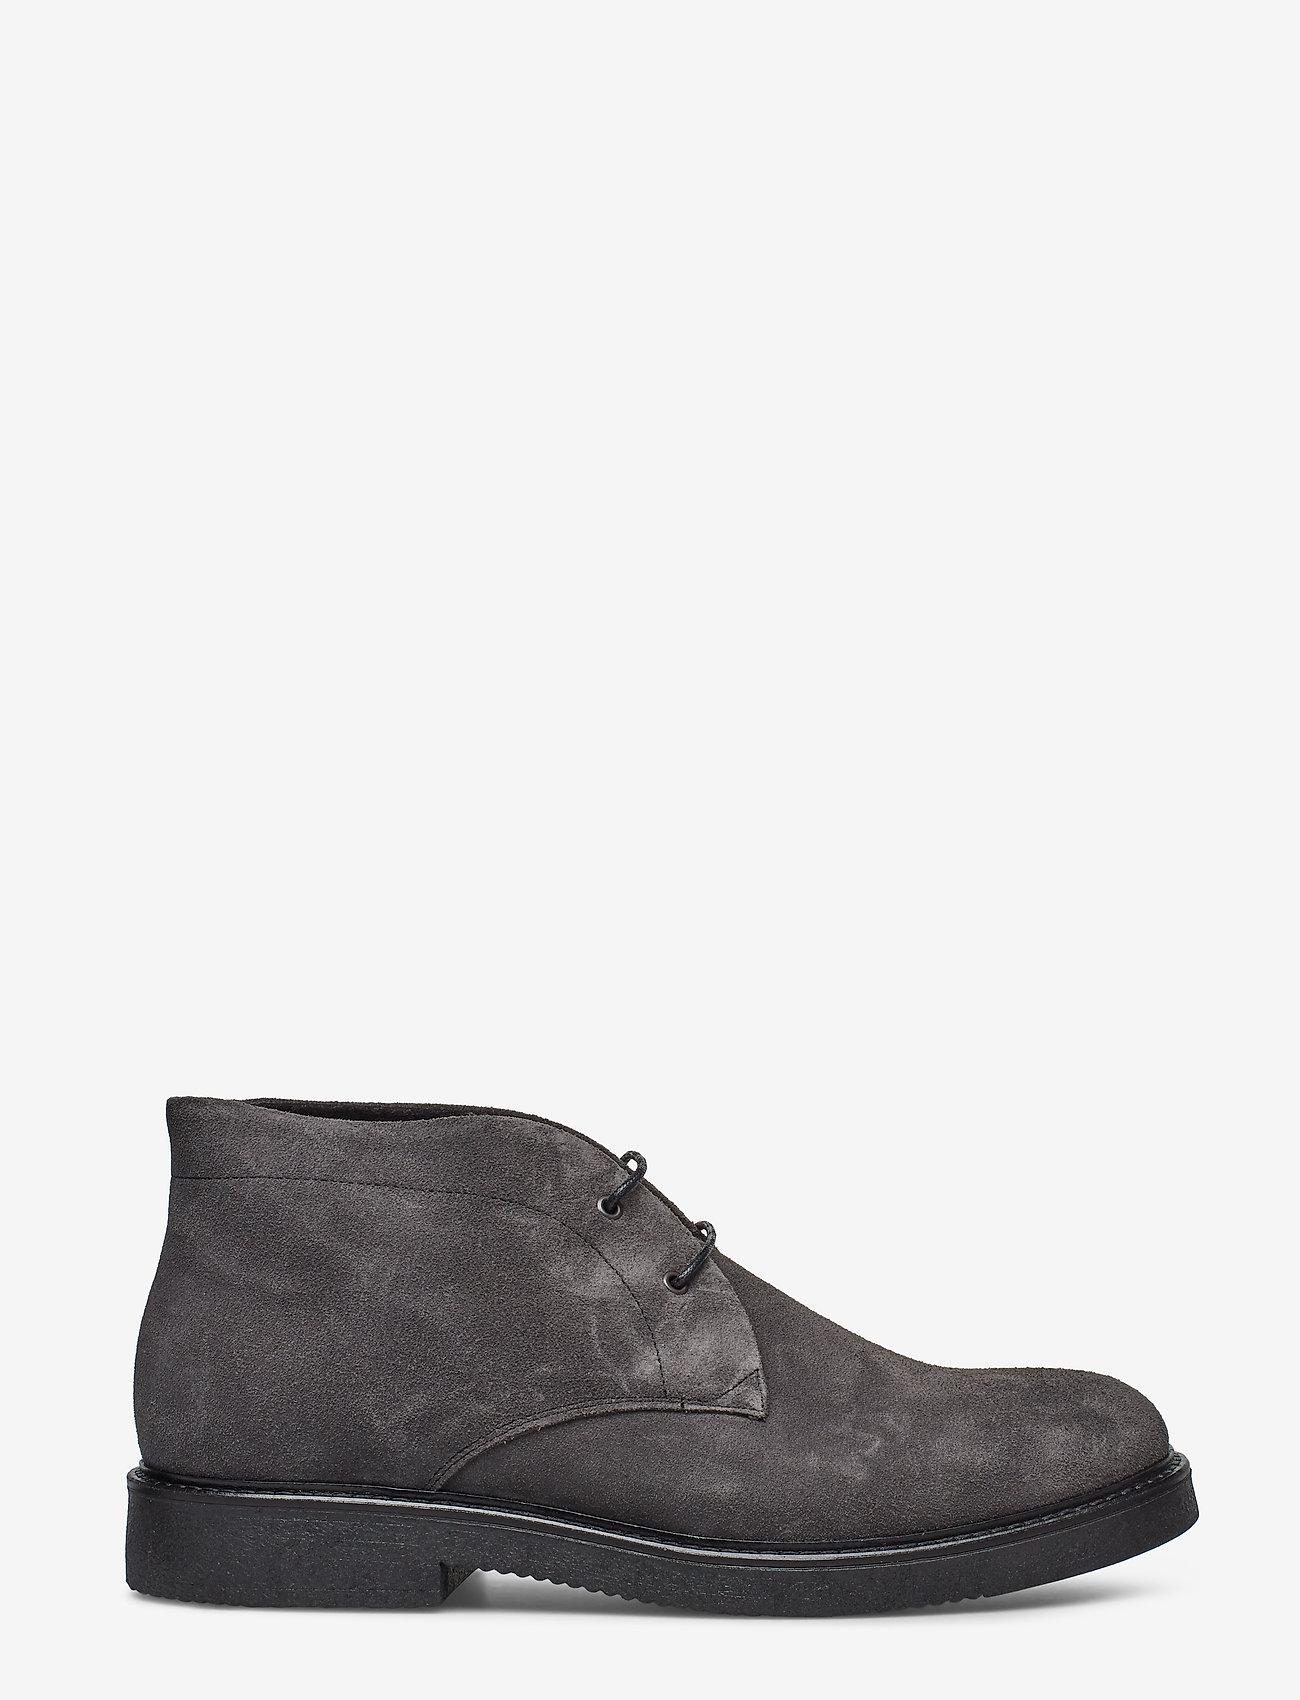 Shoe The Bear - HARDY S - desert boots - grey - 1